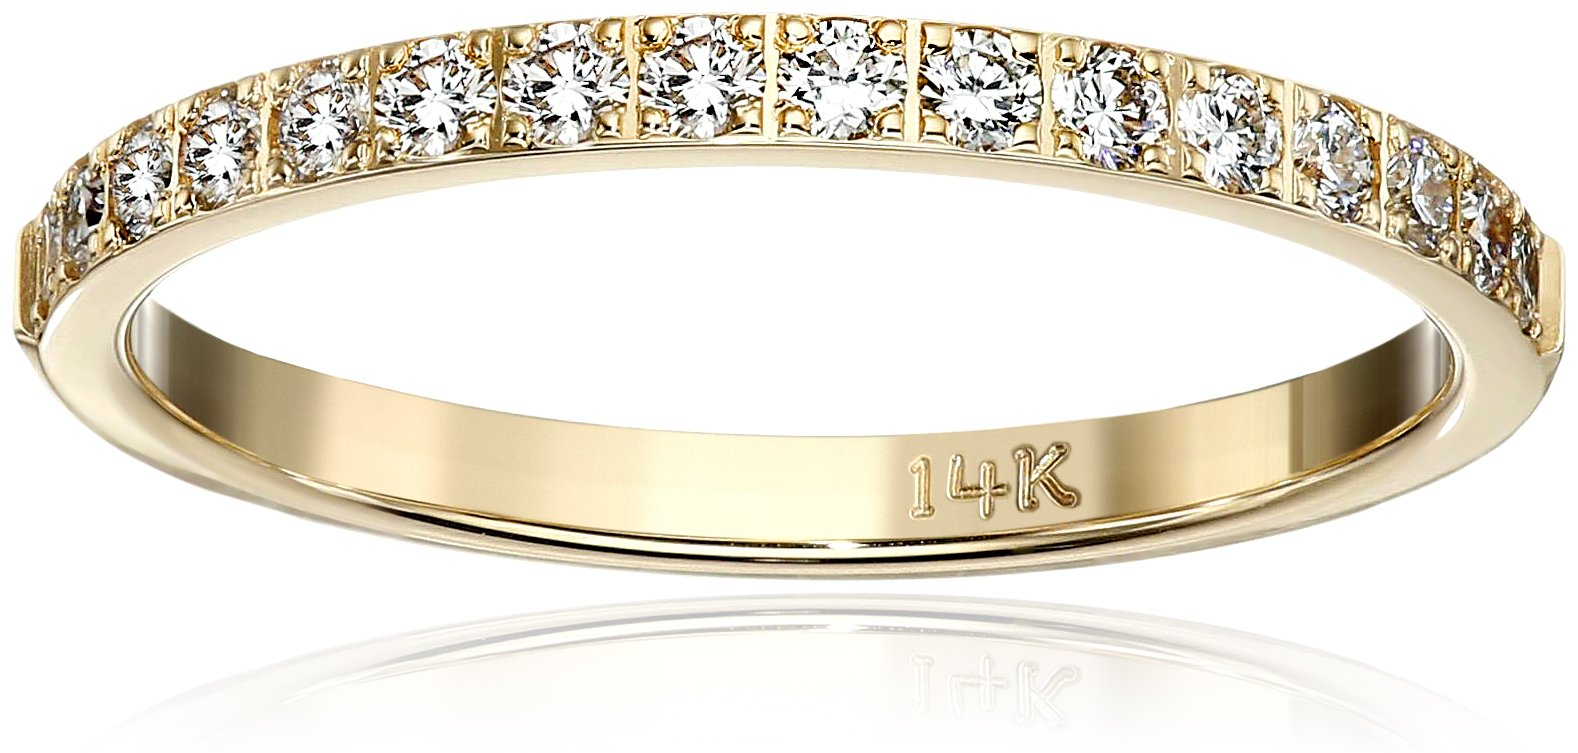 14k Yellow Gold Half-Eternity Diamond Wedding Band (2 mm) (0.32 cttw, SI-1, G Color), Size 7